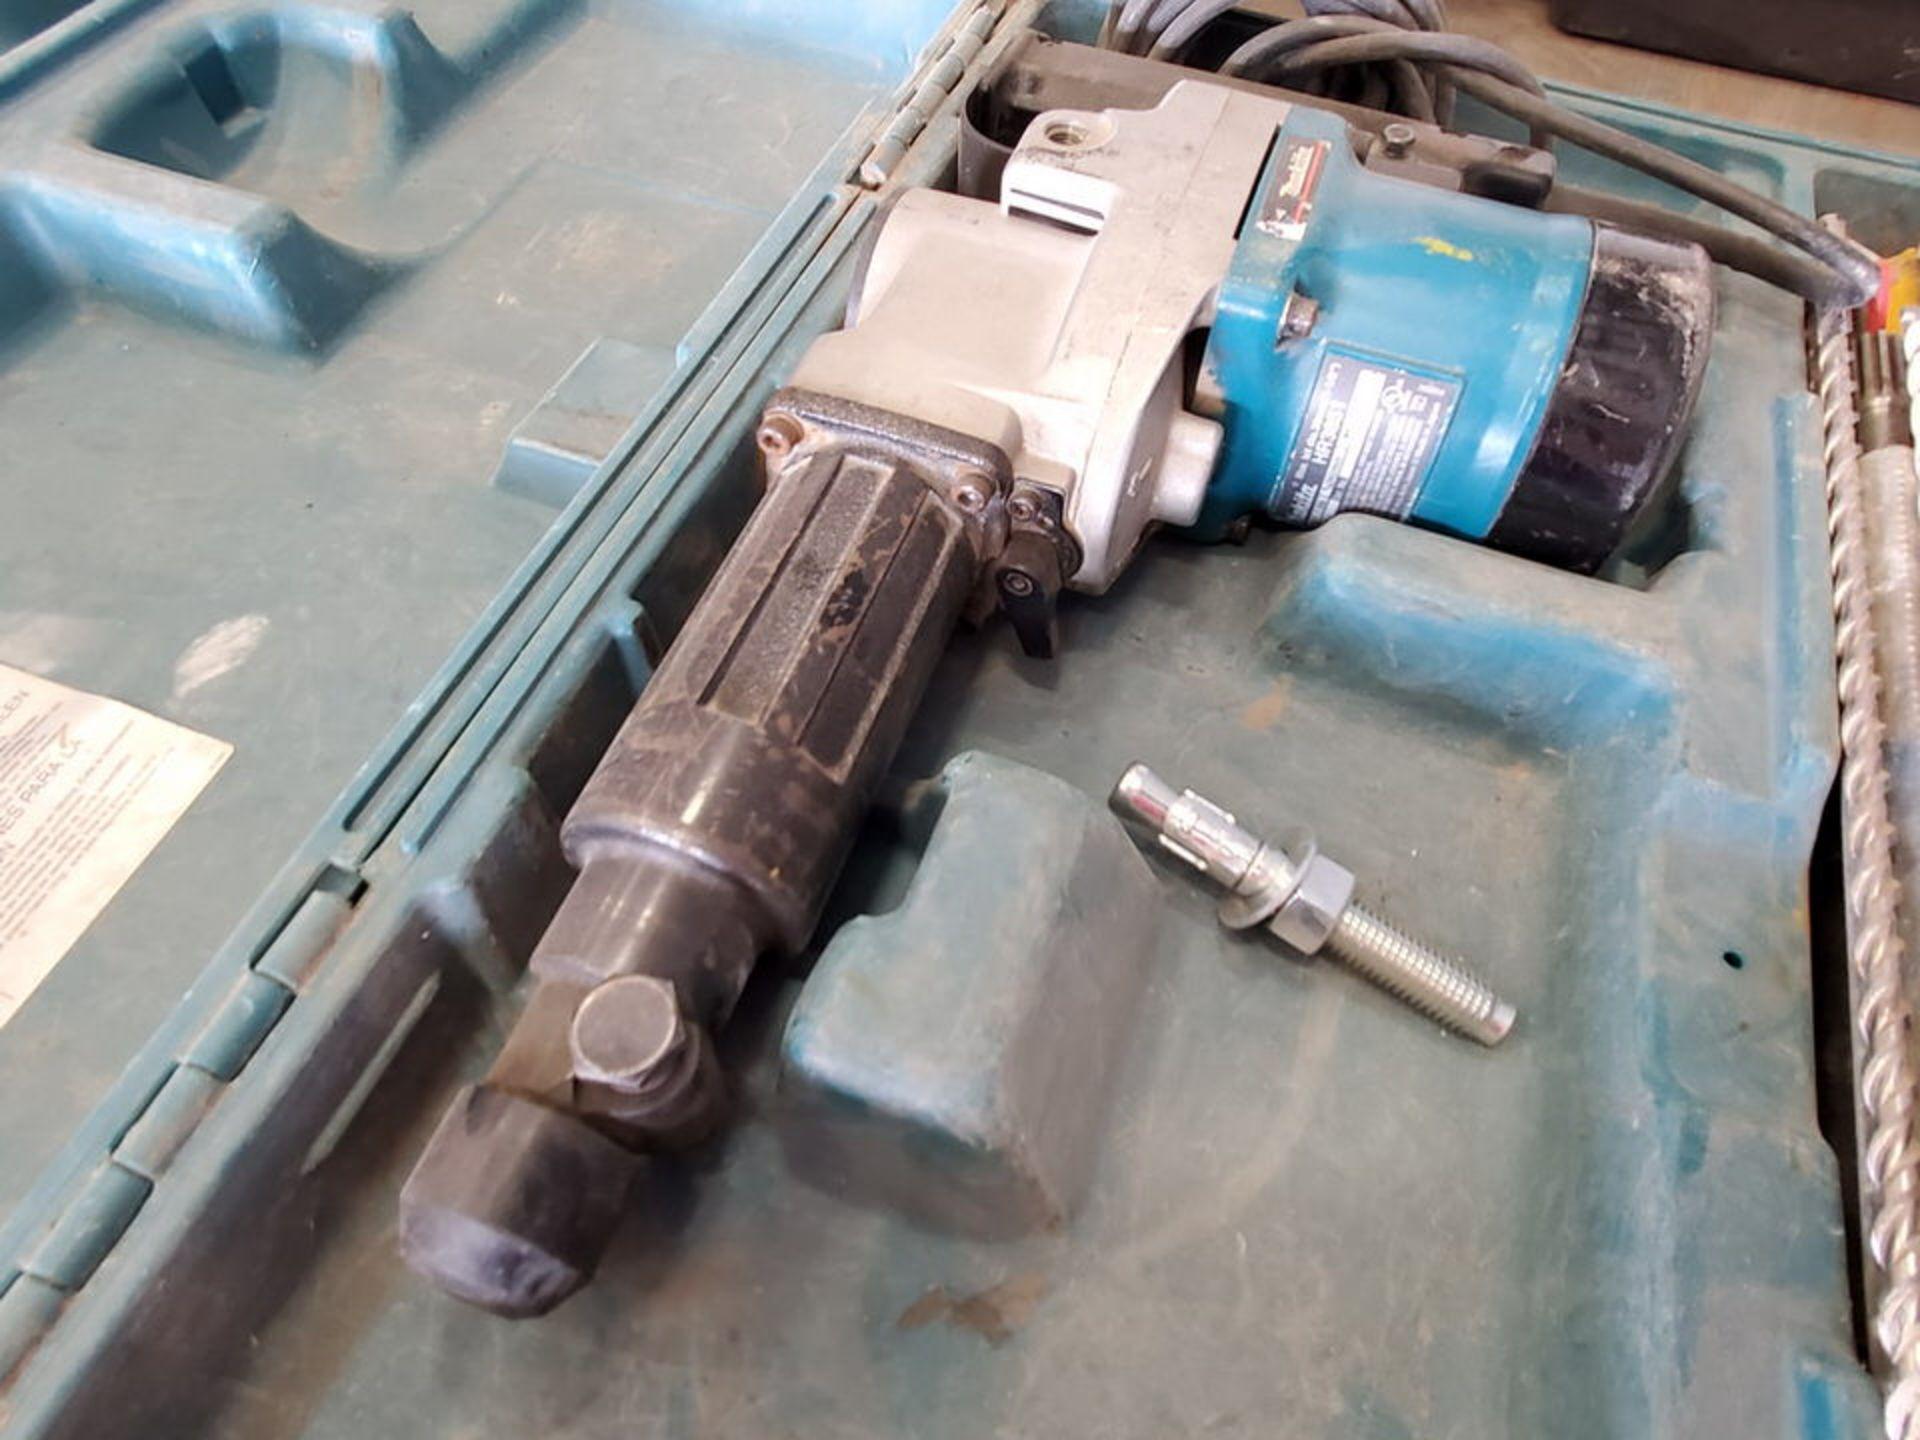 "Makita HR3851 1/2"" Rotary Hammer 120V, 10A, 2900RPM - Image 3 of 5"